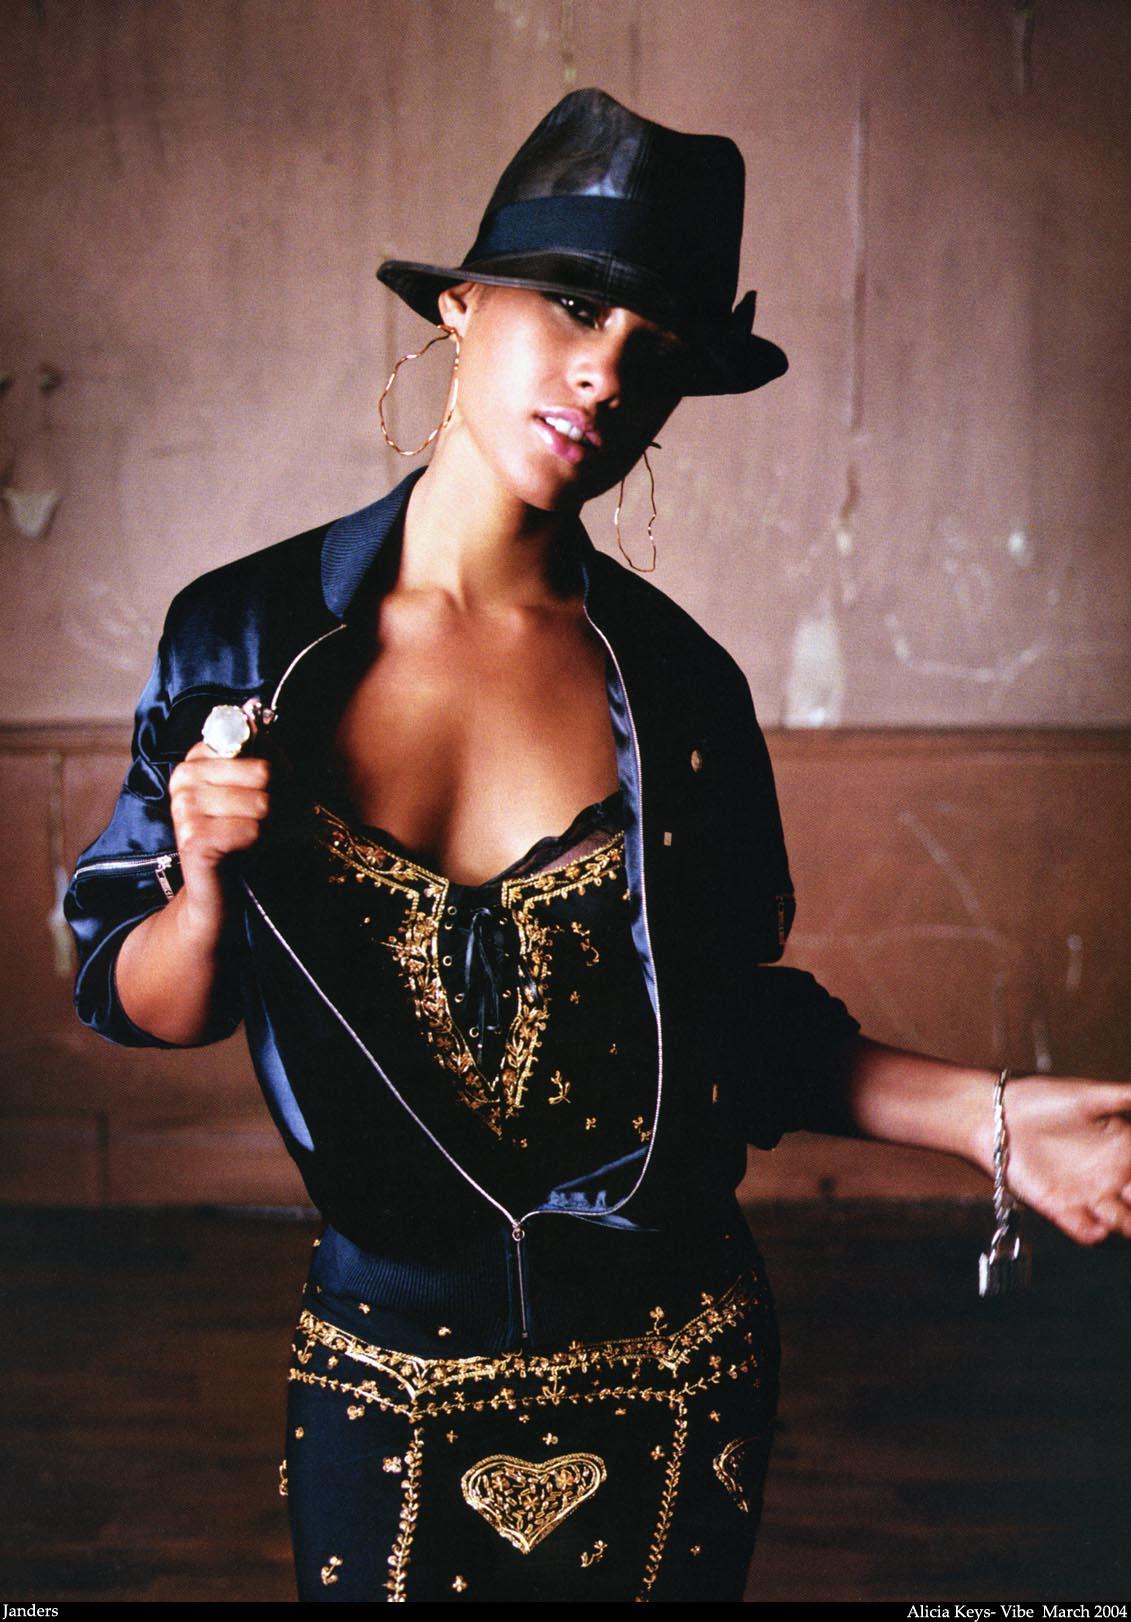 Fonds d'écran Célébrités Femme Alicia Keys